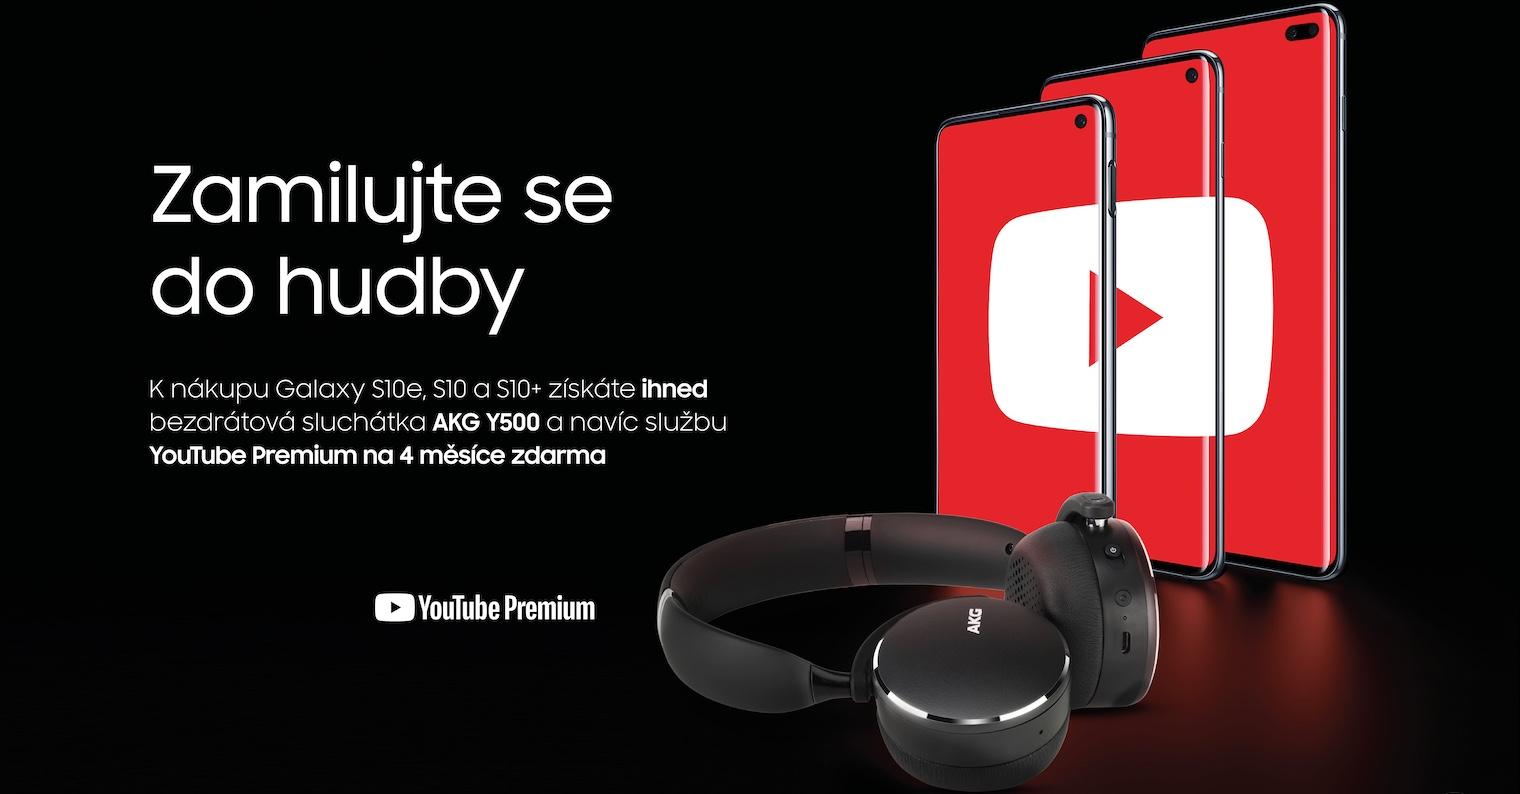 Samsung Galaxy S10 AKG Y500 zdarma